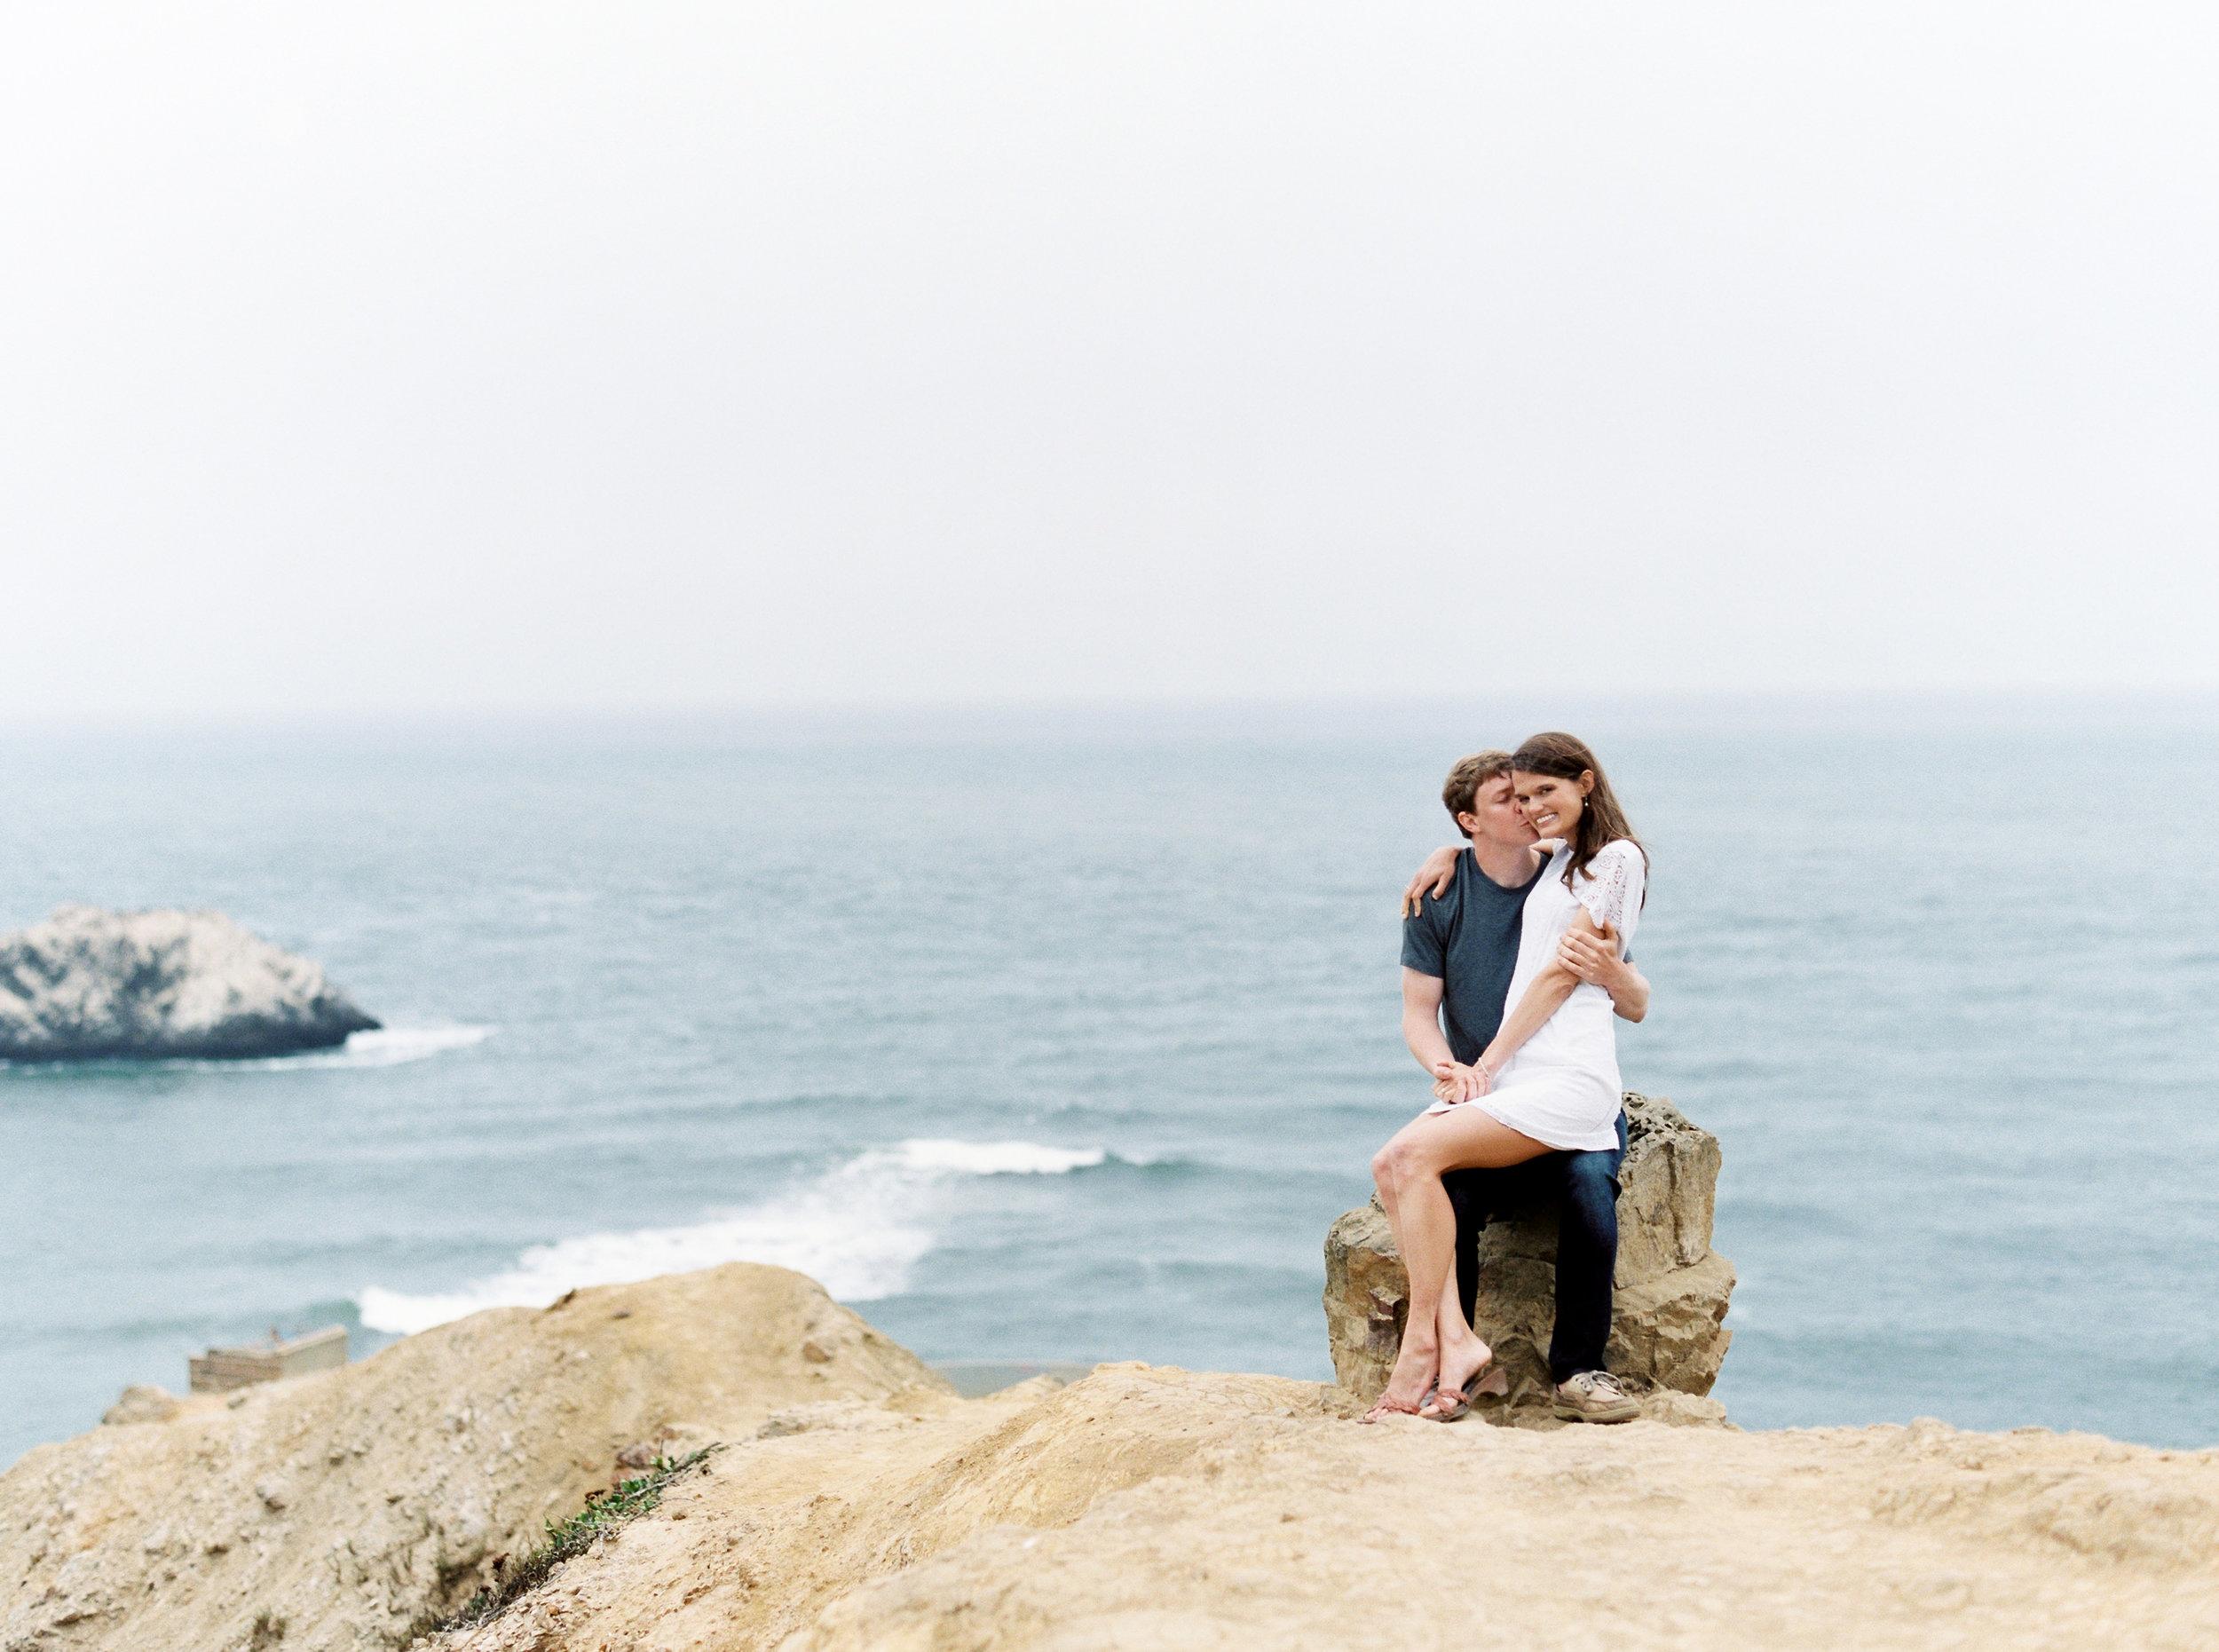 sutro-baths-san-francisco-california-engagement-12.jpg